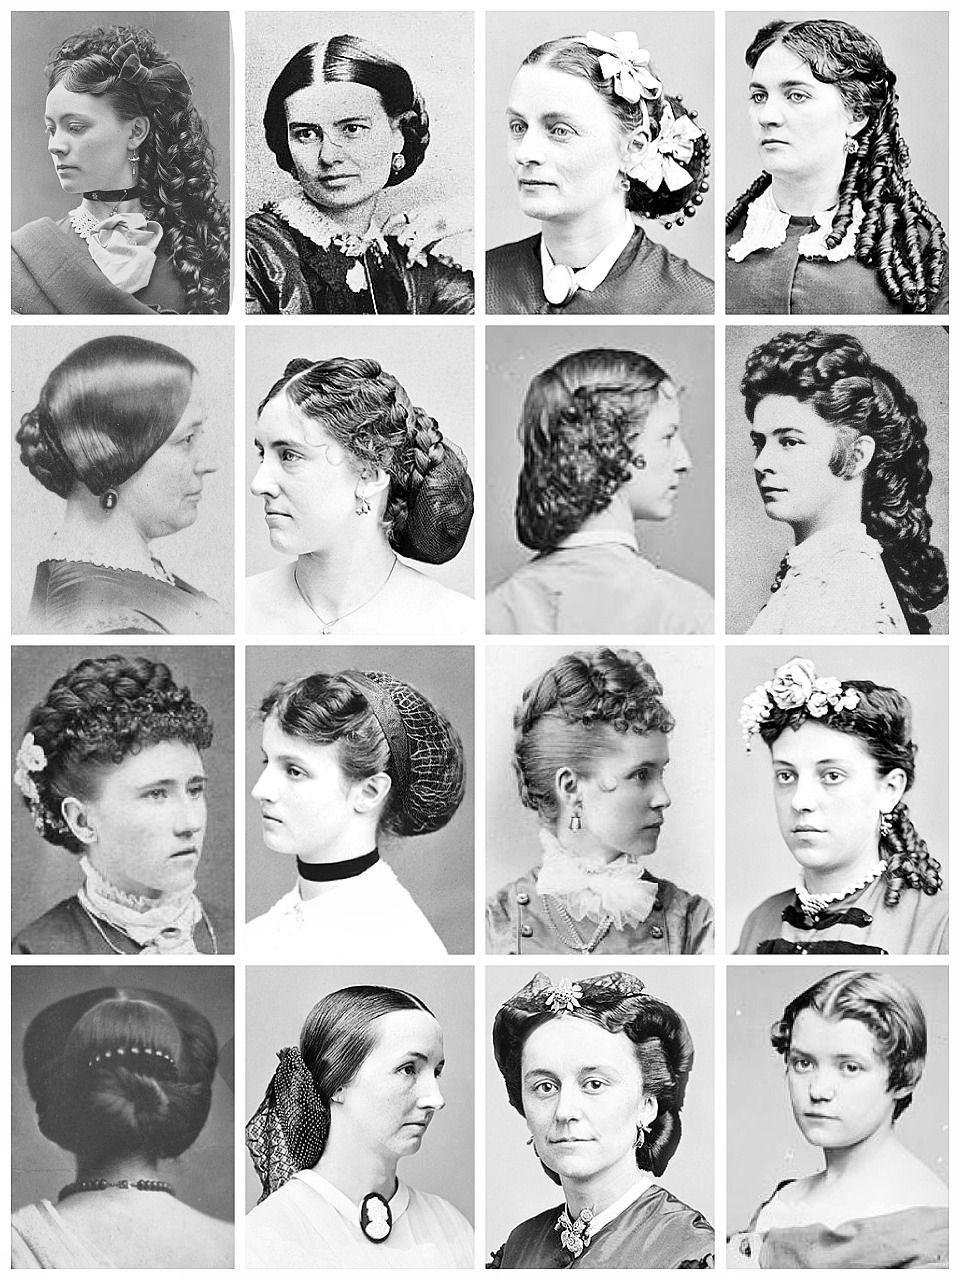 victorian era hair victorian era hair styles | history